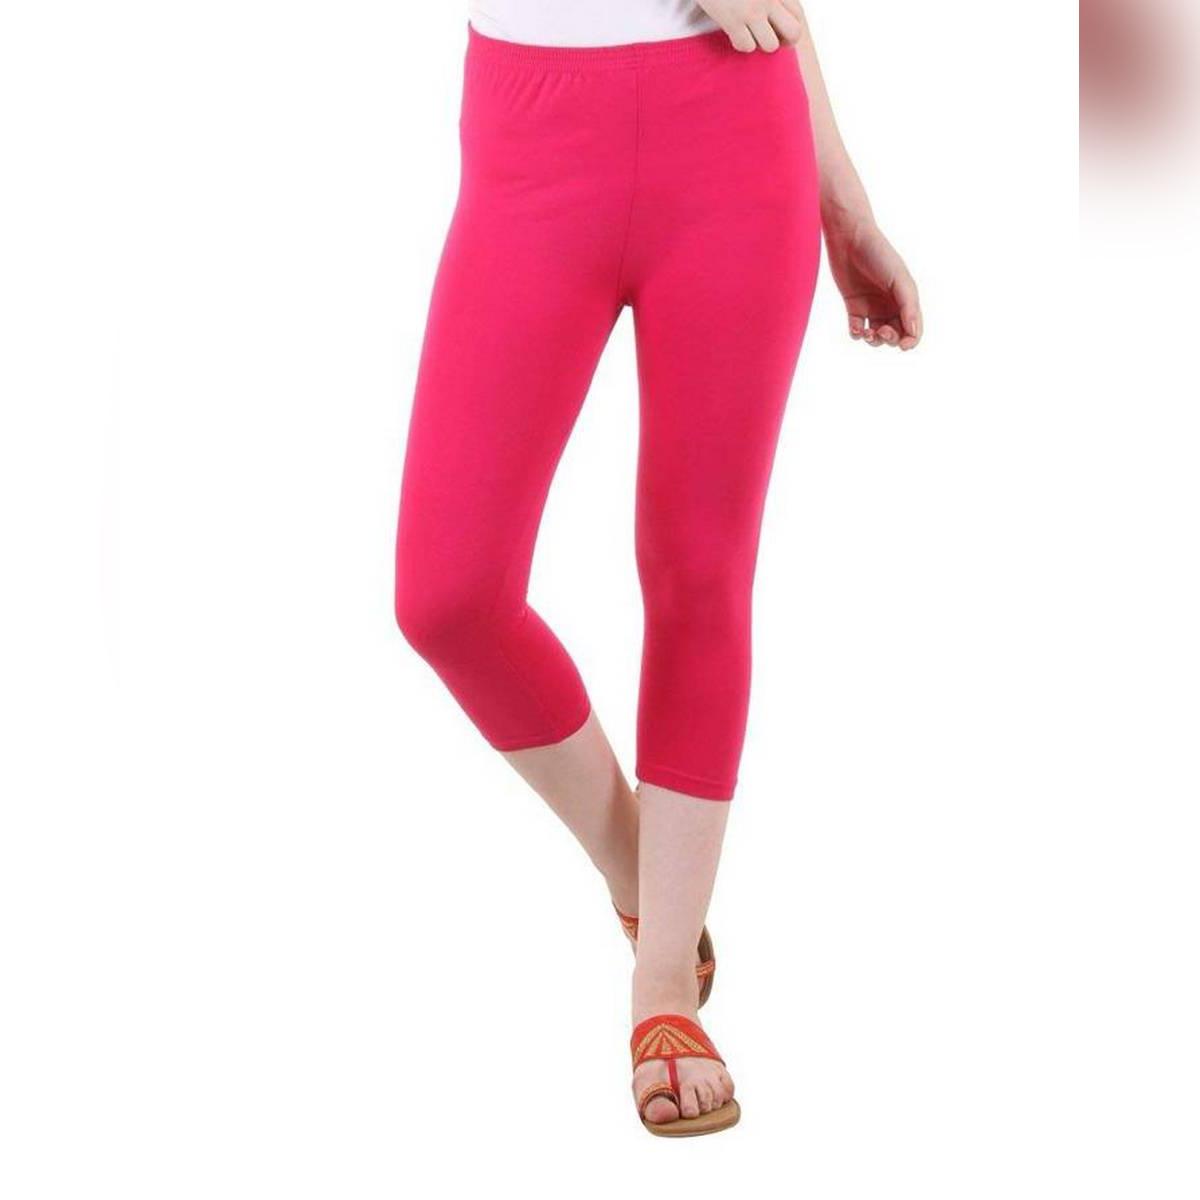 Hot Pink Cotton Capri Leggigns For Women